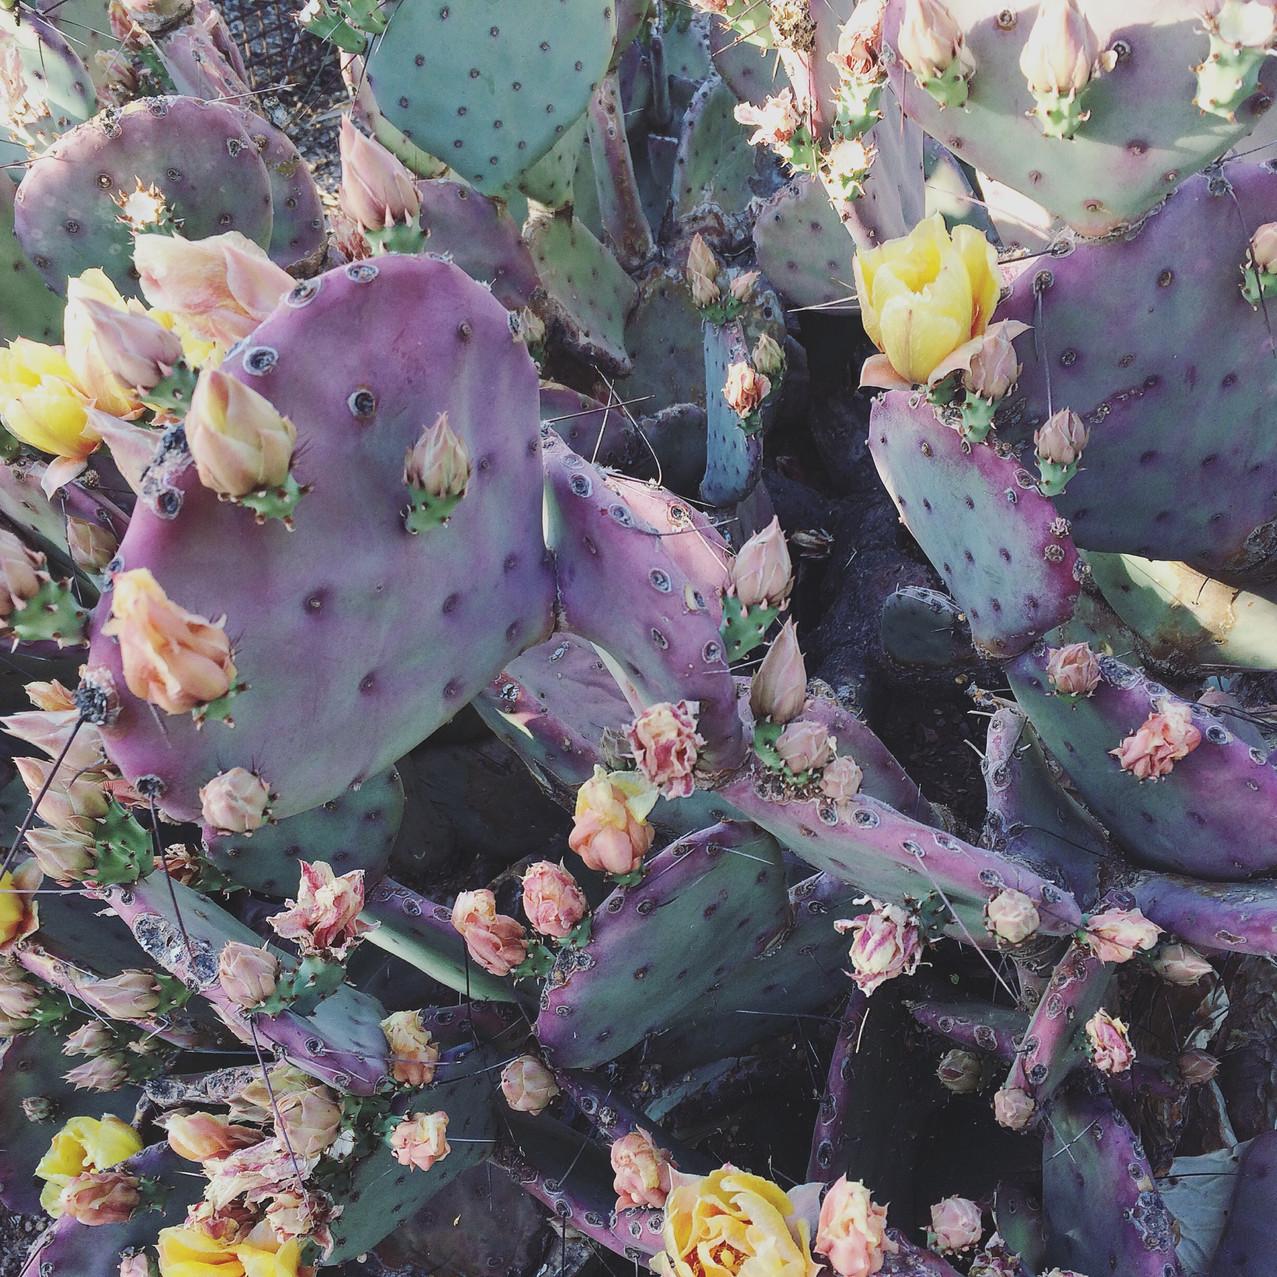 Opunta Violaciae, Prickly Pear